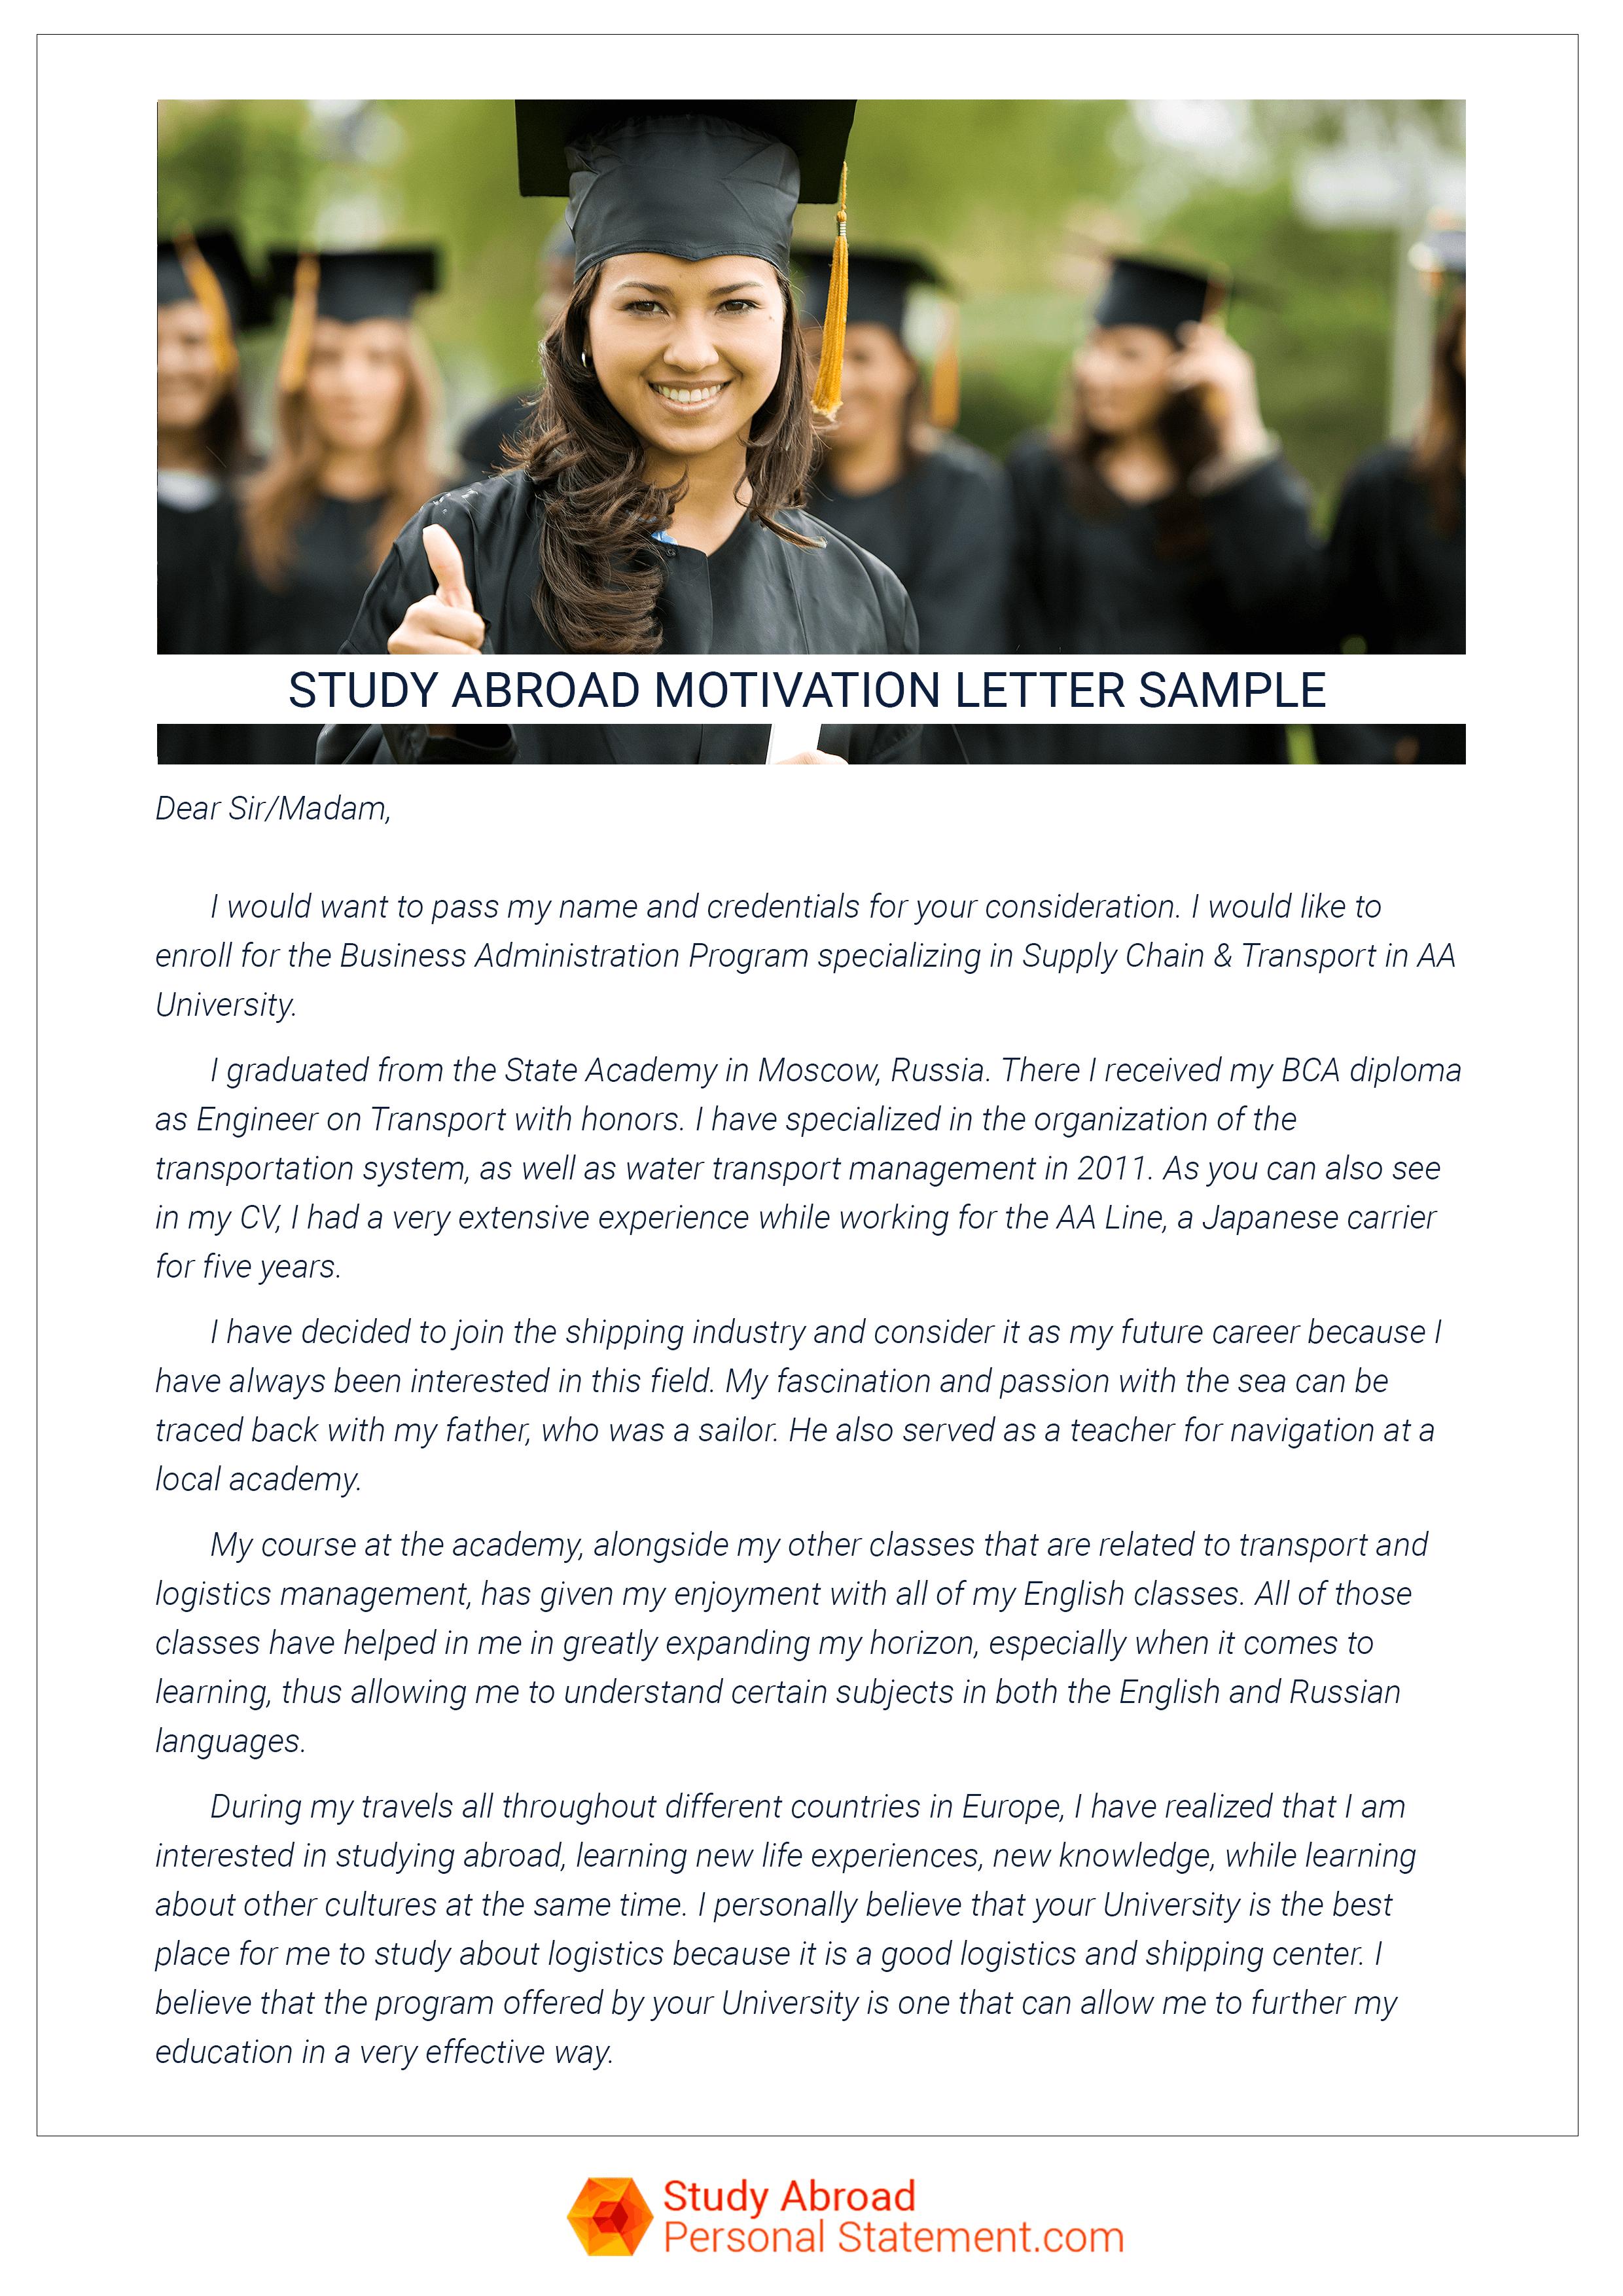 http://www.studyabroadpersonalstatement.com/international ...